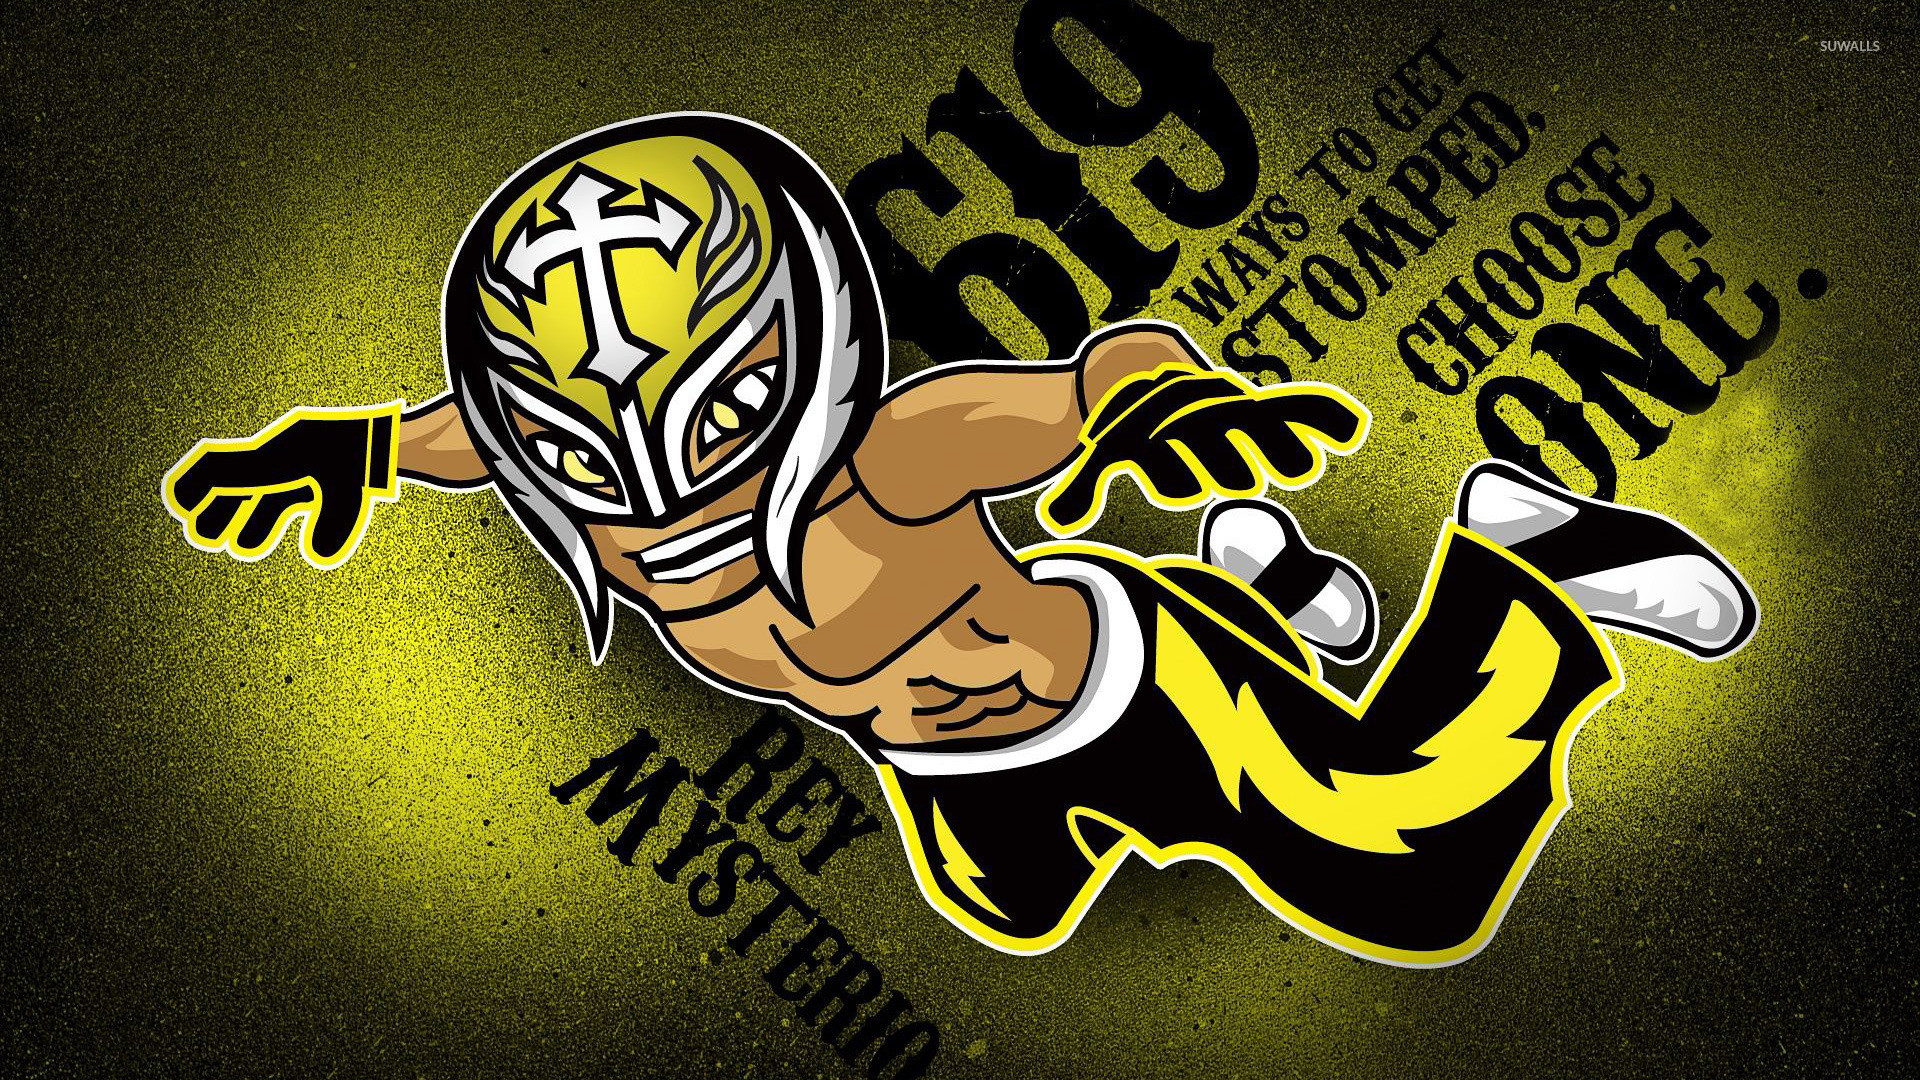 Randy orton viper logo - photo#43